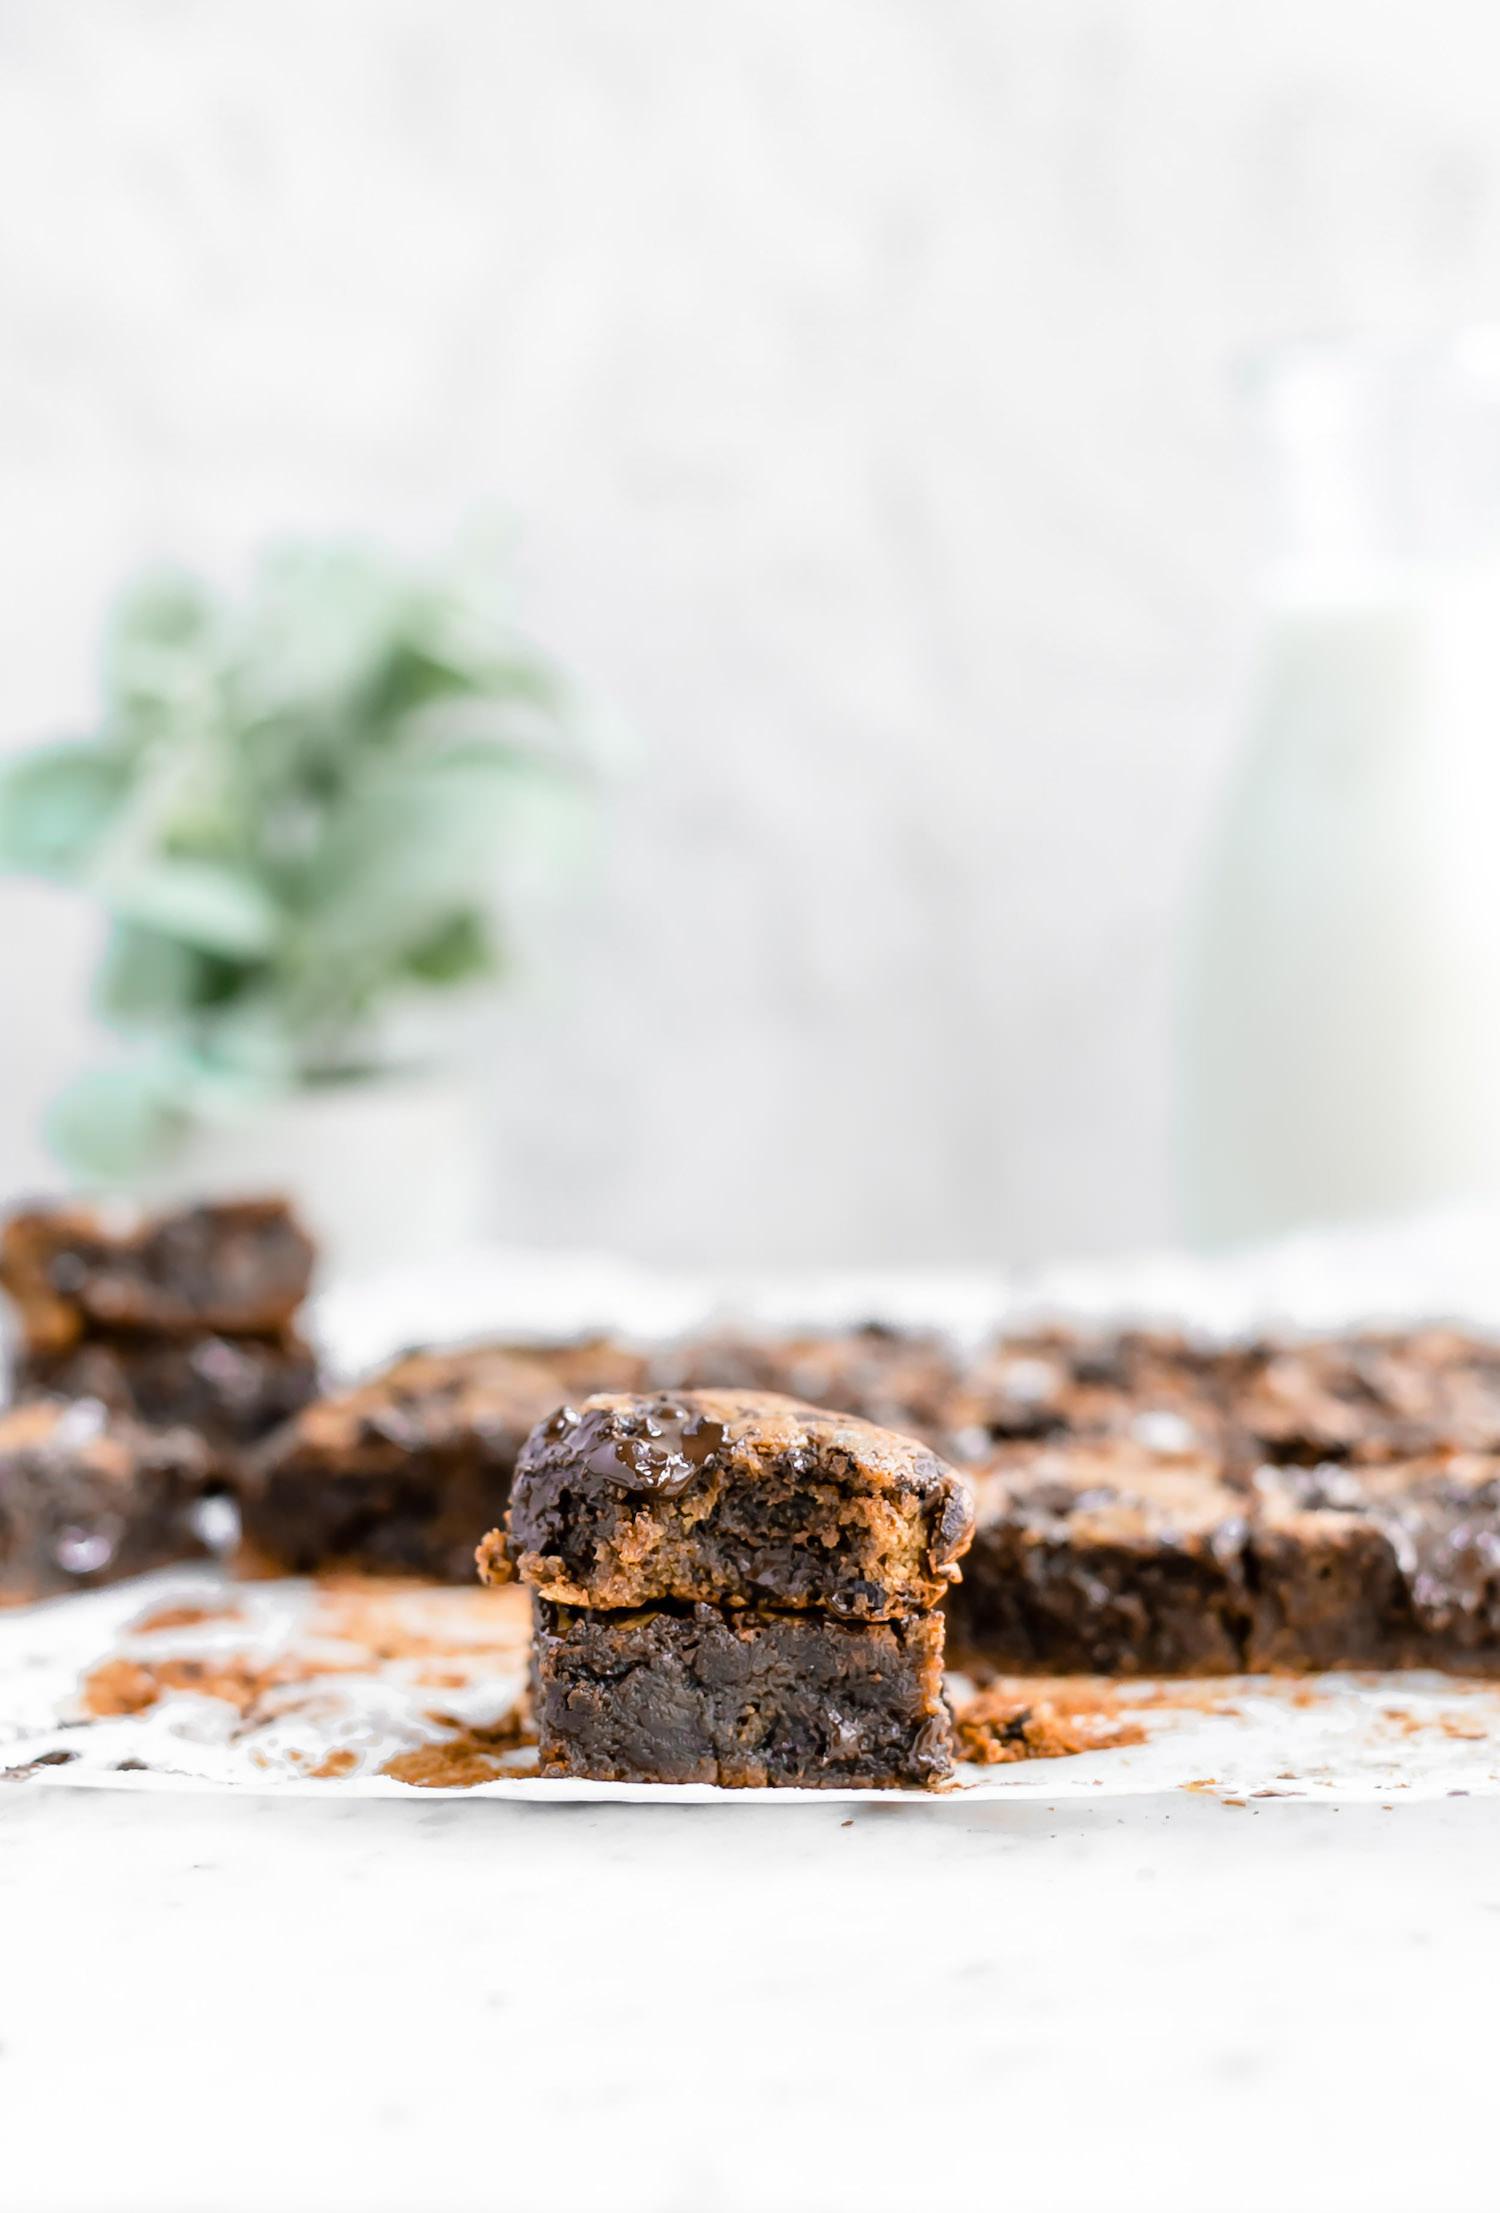 Wholesome Gluten-Free Tahini Chocolate Chip Blondies: rich, dense, gooey blondies made with tahini, coconut sugar, and chocolate chunks. Dairy and gluten free! | TrufflesandTrends.com